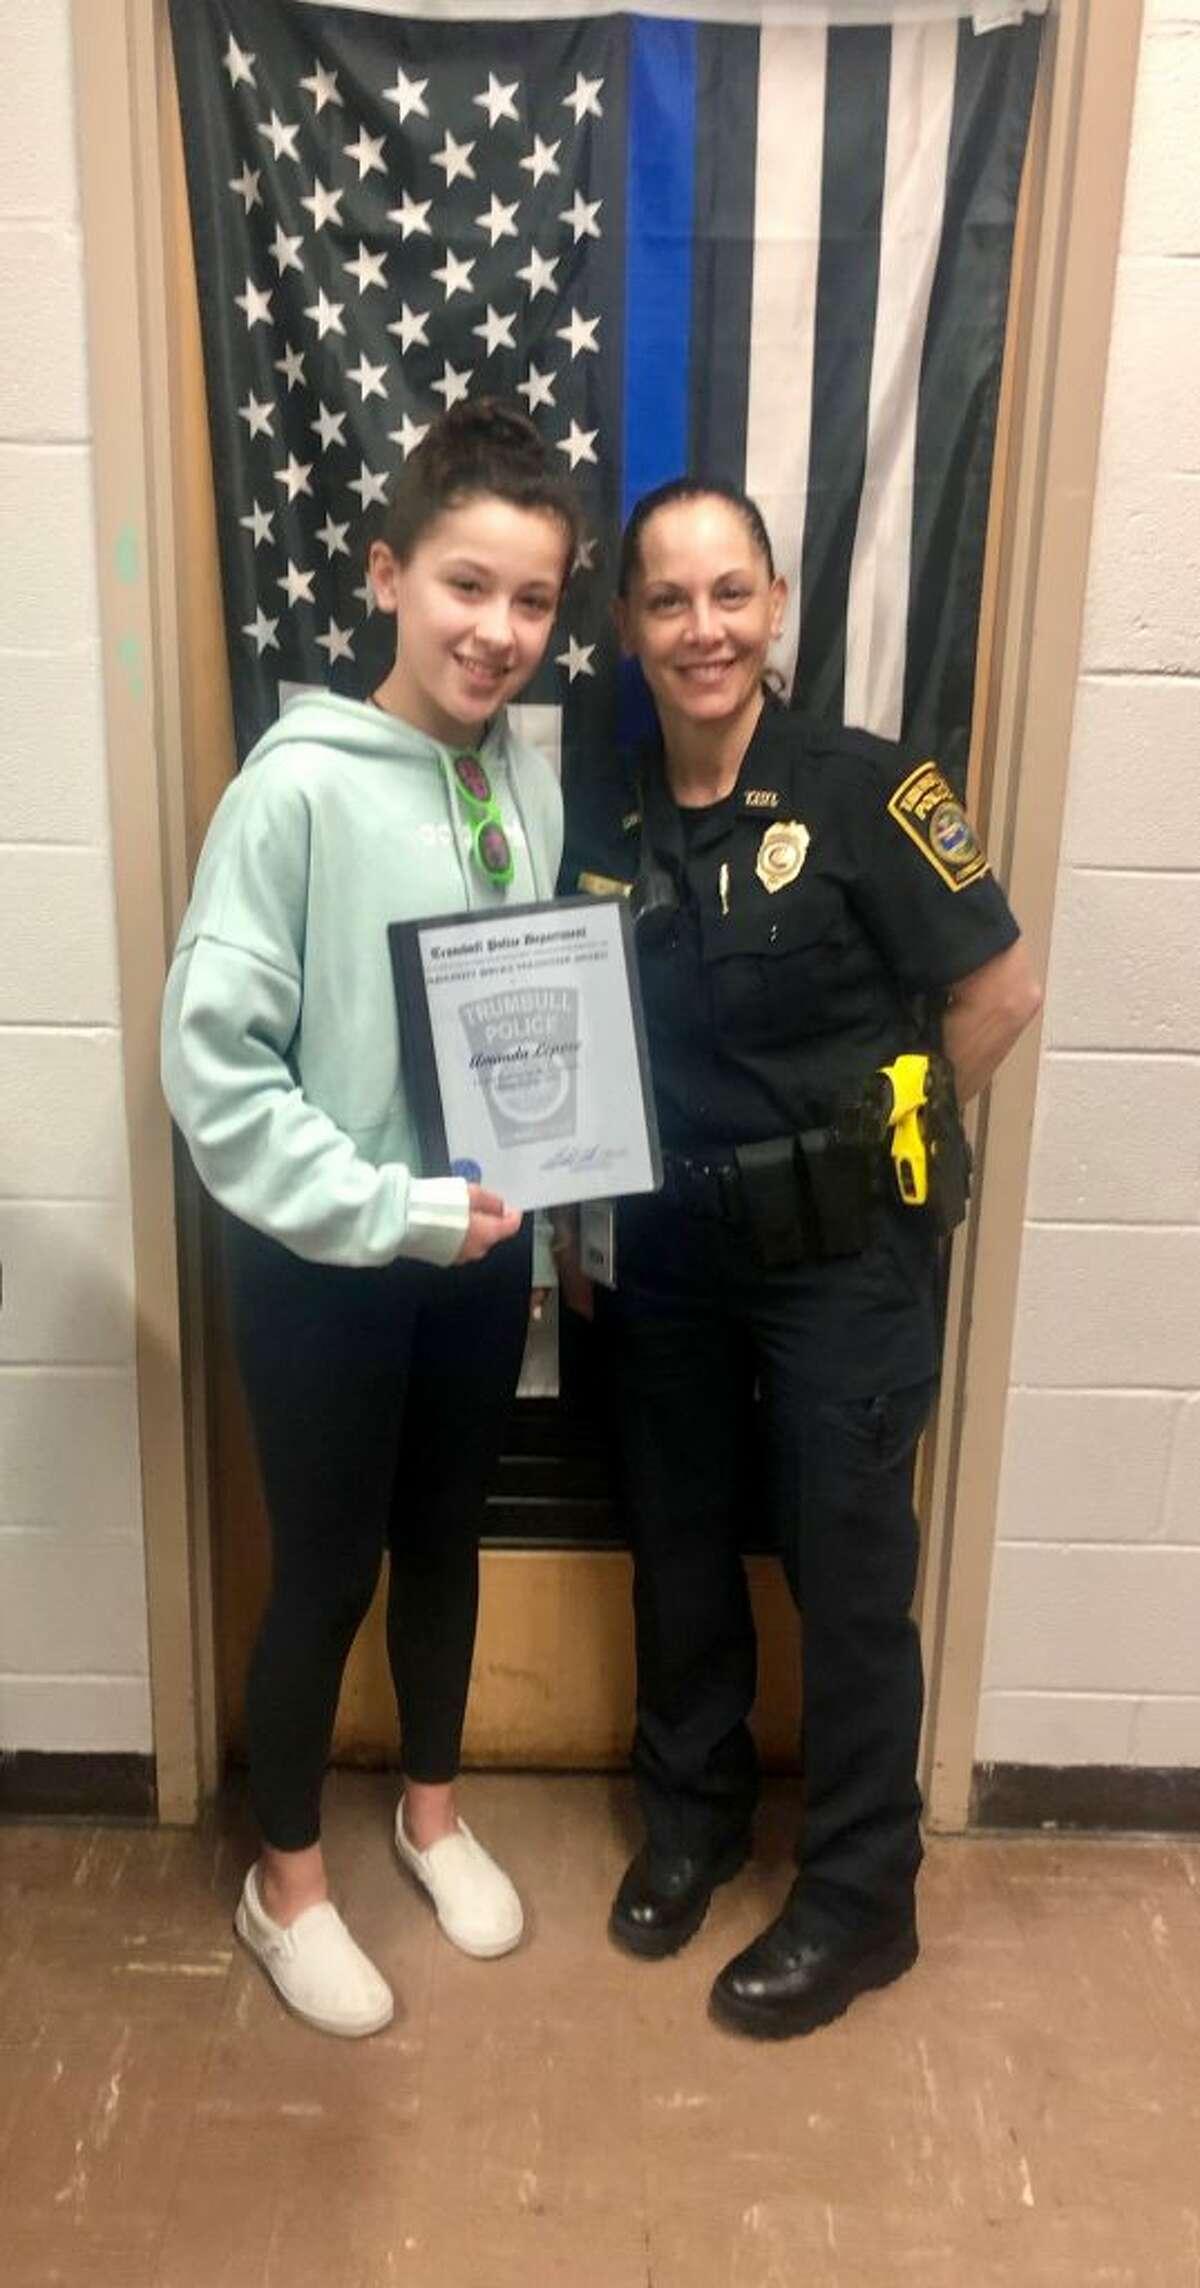 Amanda Lepore and School Resource Officer Theresa Massa.